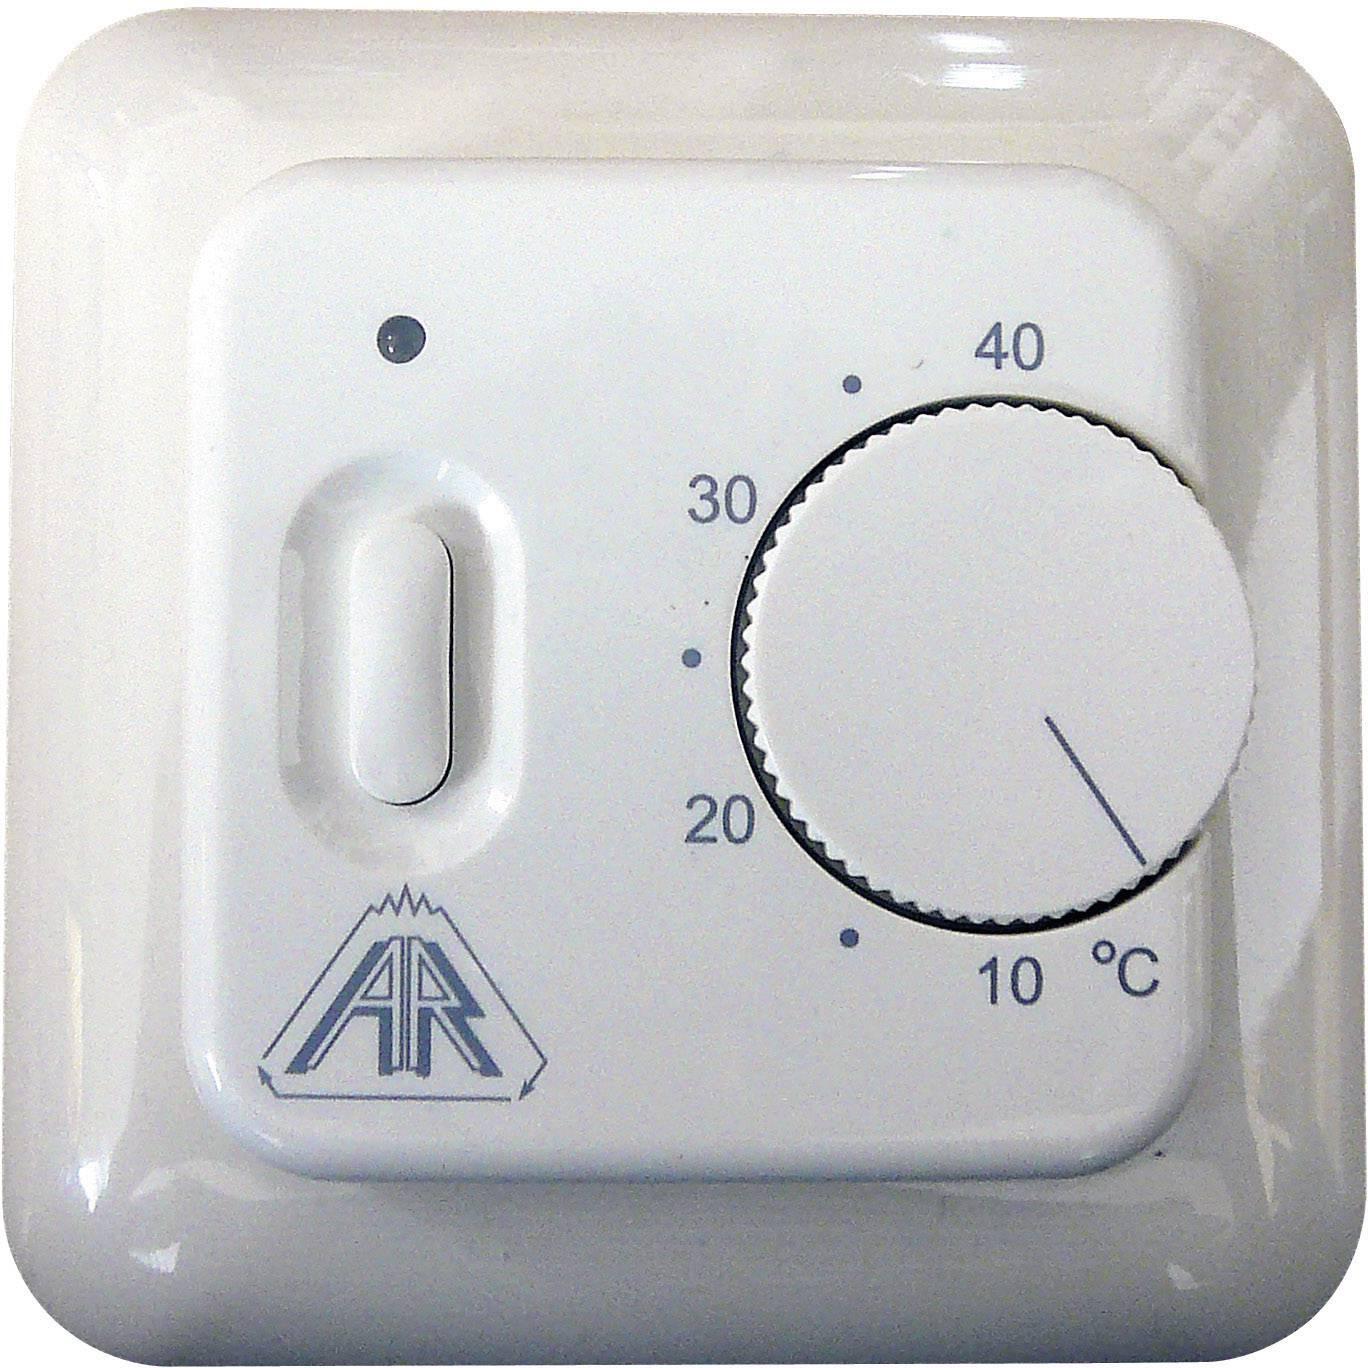 Termostat Arnold Rak ST-AR 16, 0 až 60 °C, biely